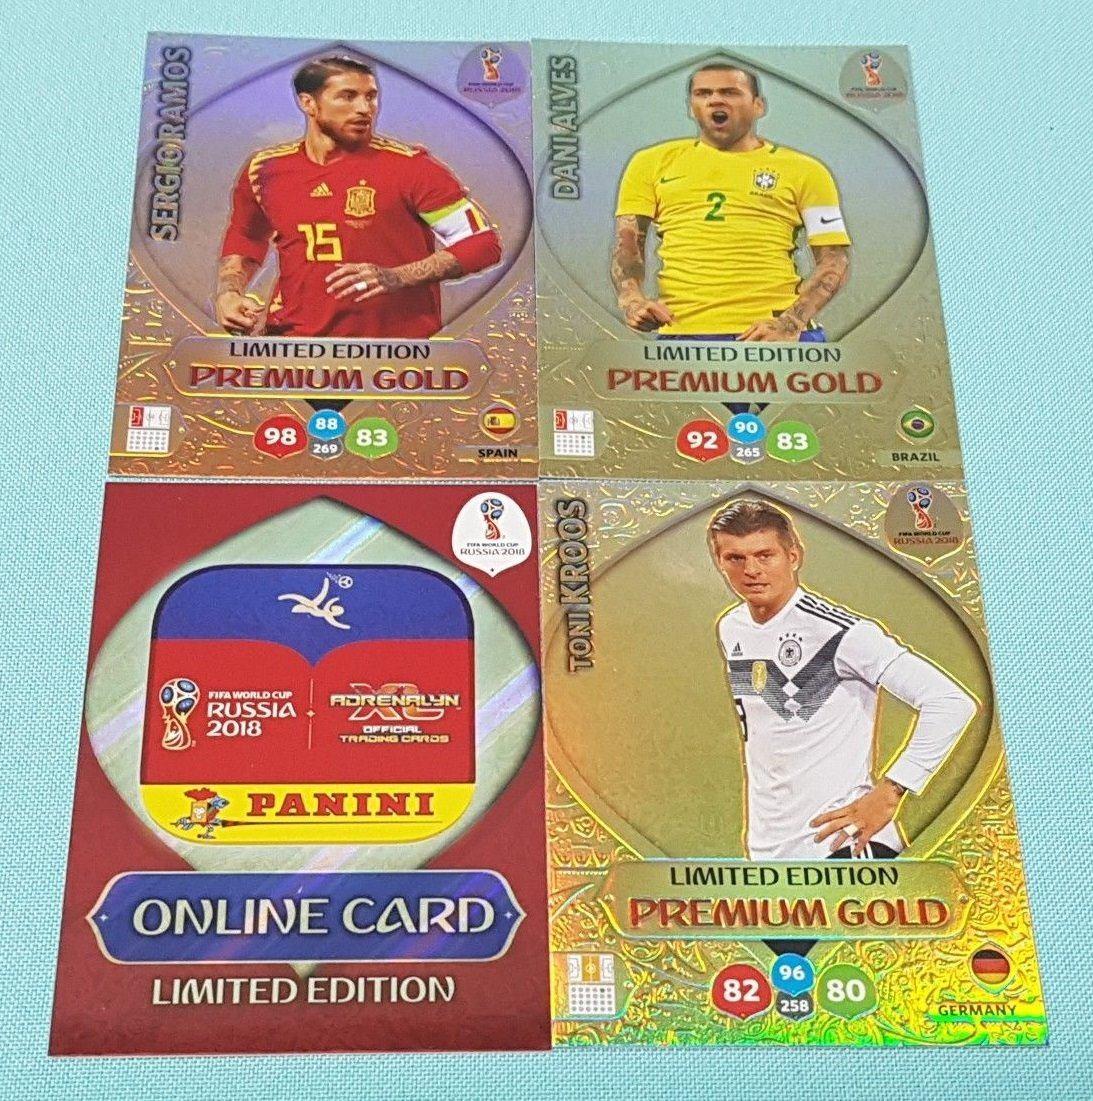 de2657672bac cards copa 2018 adrenalyn 4x limited edition premium gold. Carregando zoom.